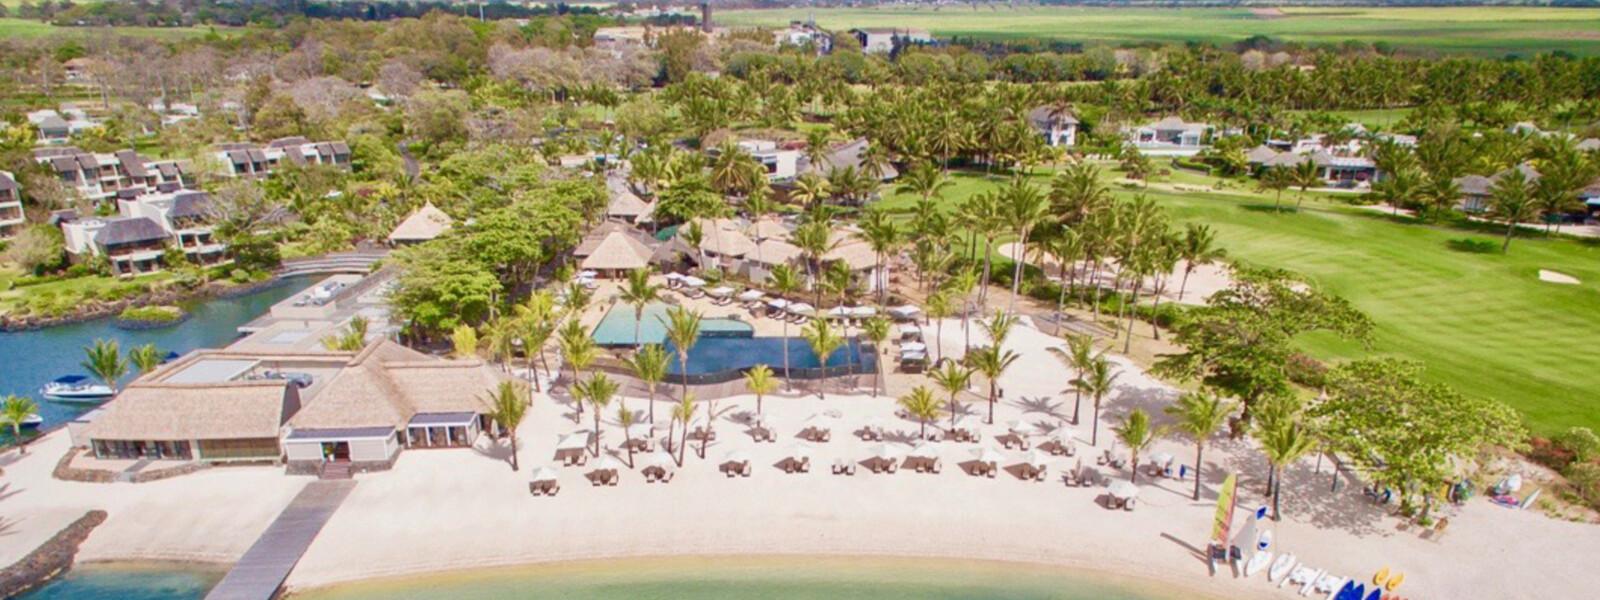 Anahita Golf & Spa Resort Mauritius - ein Golfmotion Top Partner